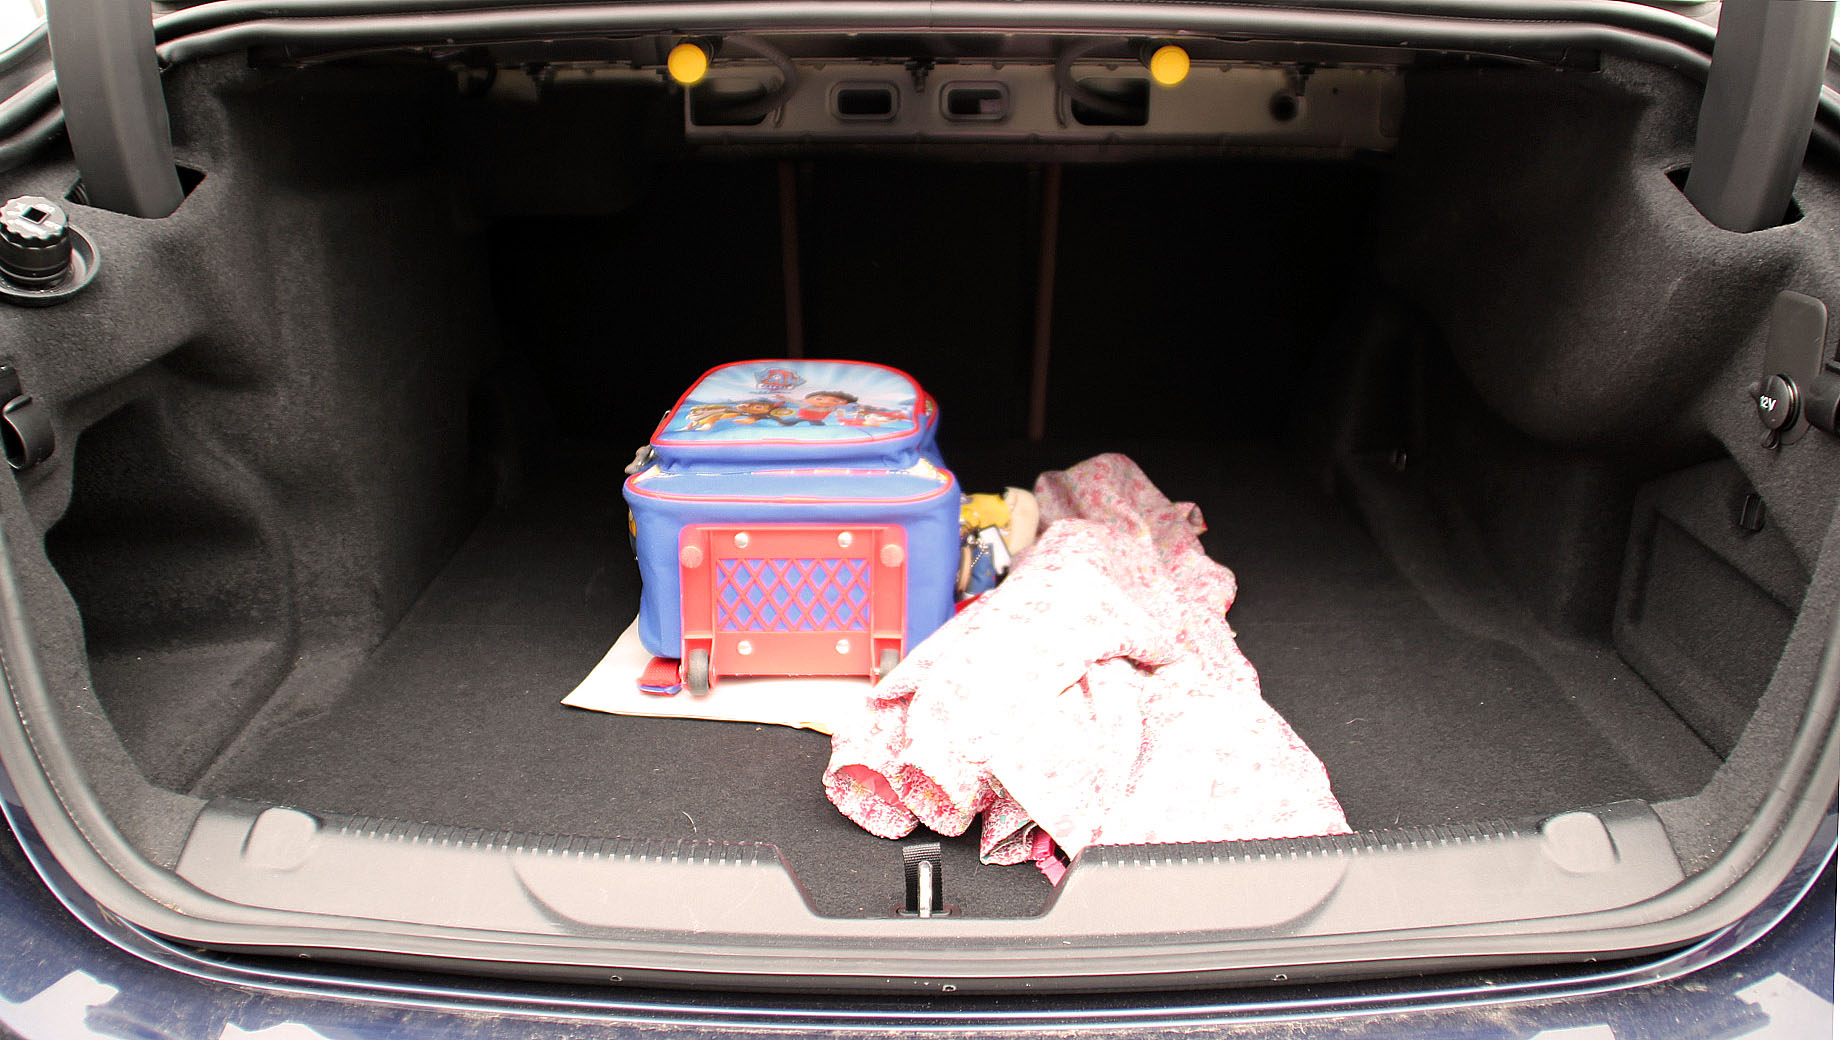 Jaguar XE, Jaguar XE reviews, dad blog uk, dadbloguk.com, school run dad